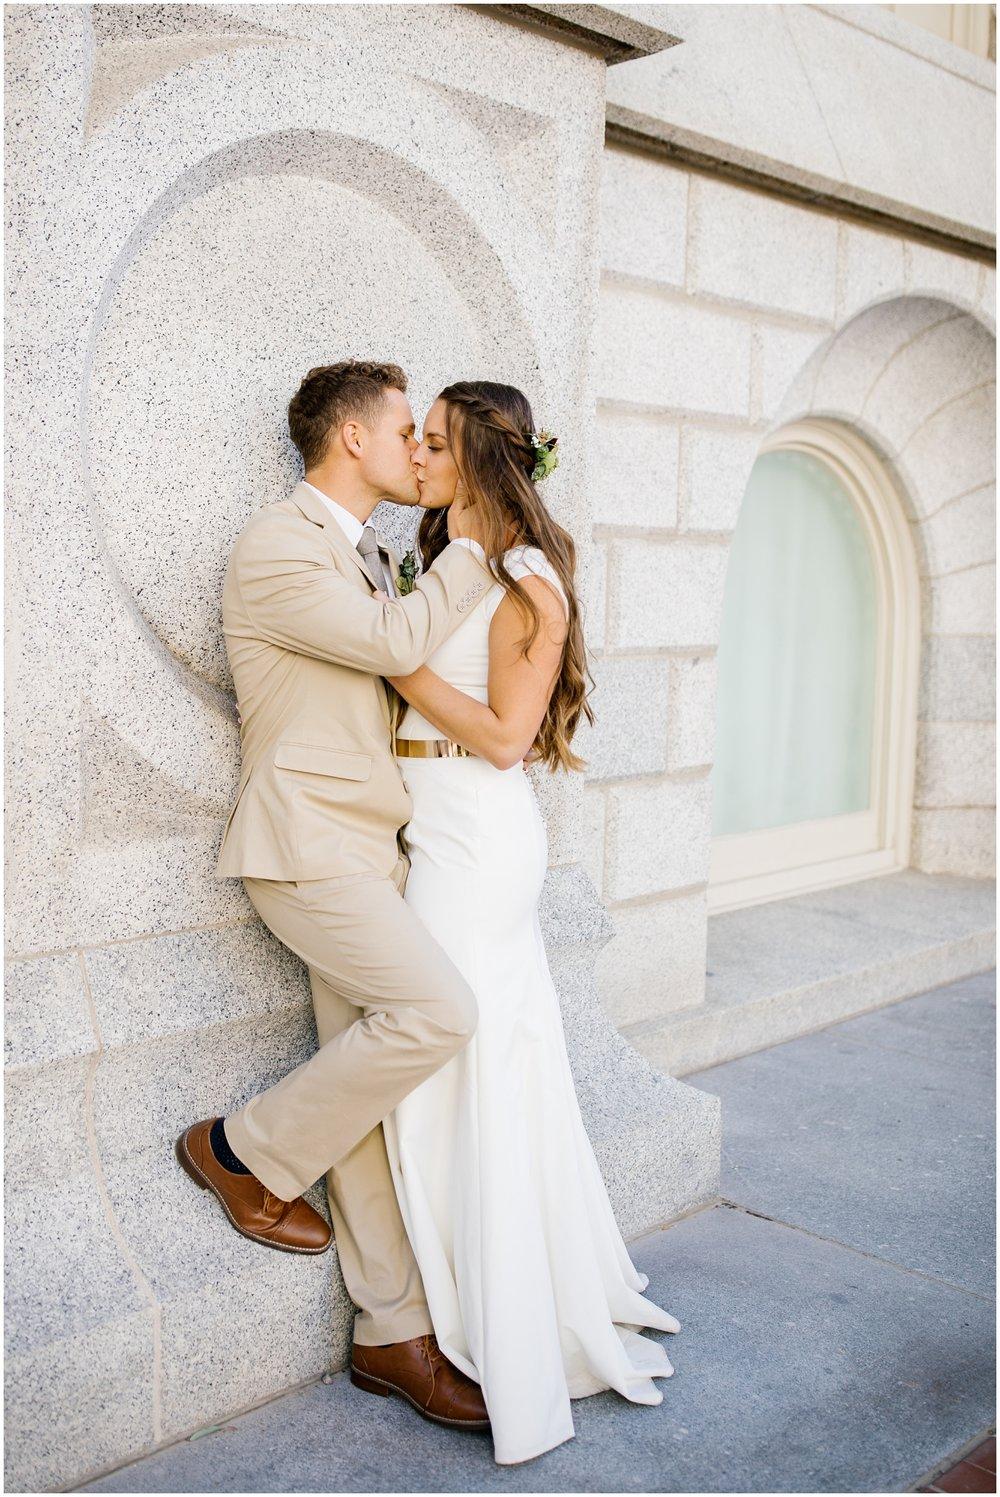 JC-Wedding-184_Lizzie-B-Imagery-Utah-Wedding-Photographer-Park-City-Salt-Lake-City-Temple-Joseph-Smith-Memorial-Building-Empire-Room.jpg